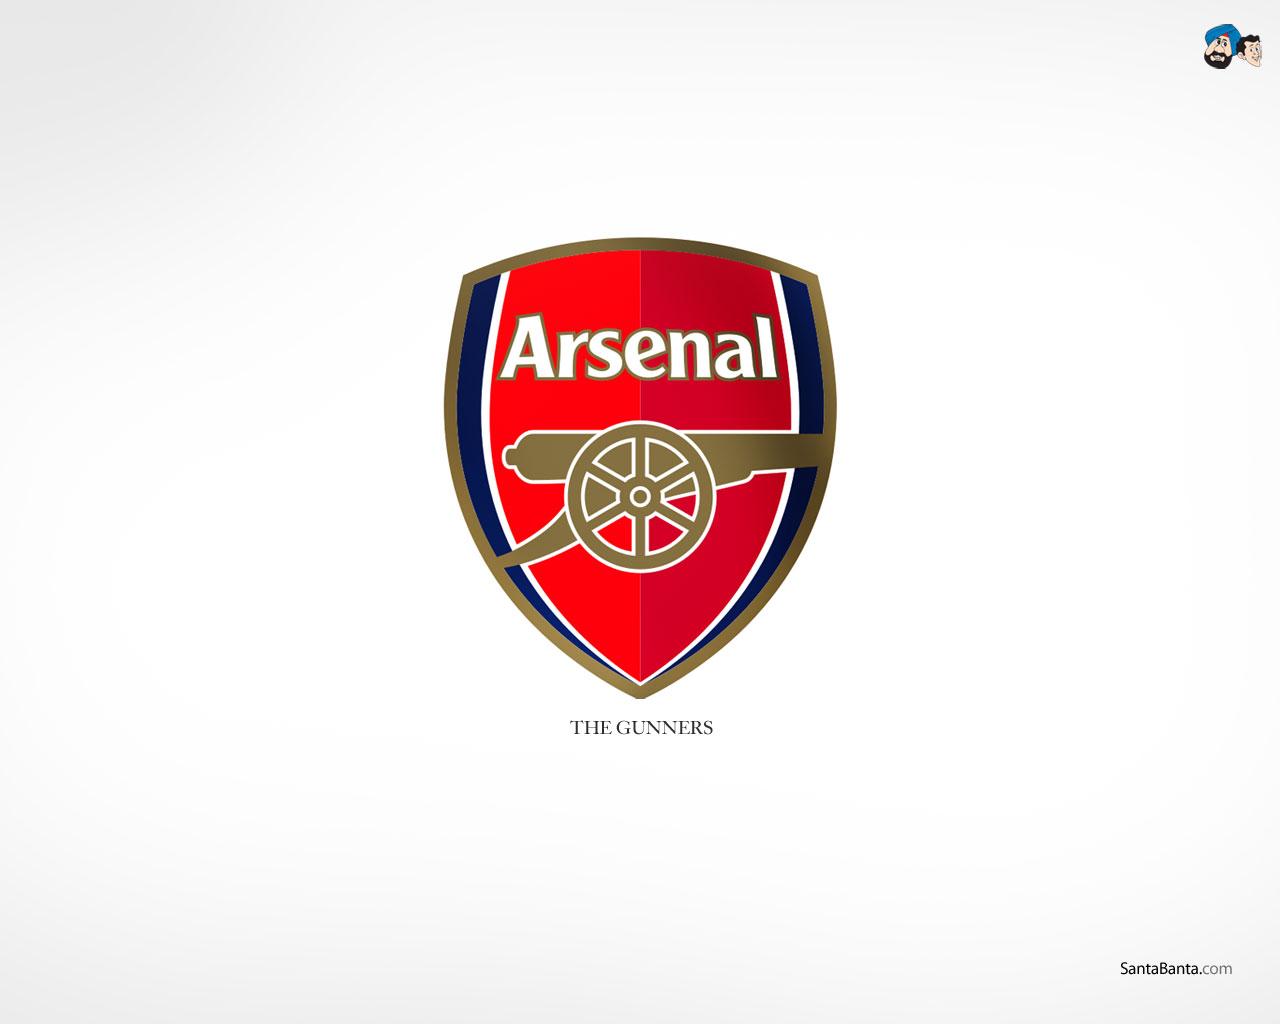 wallpapers hd for mac arsenal football club logo wallpaper hd